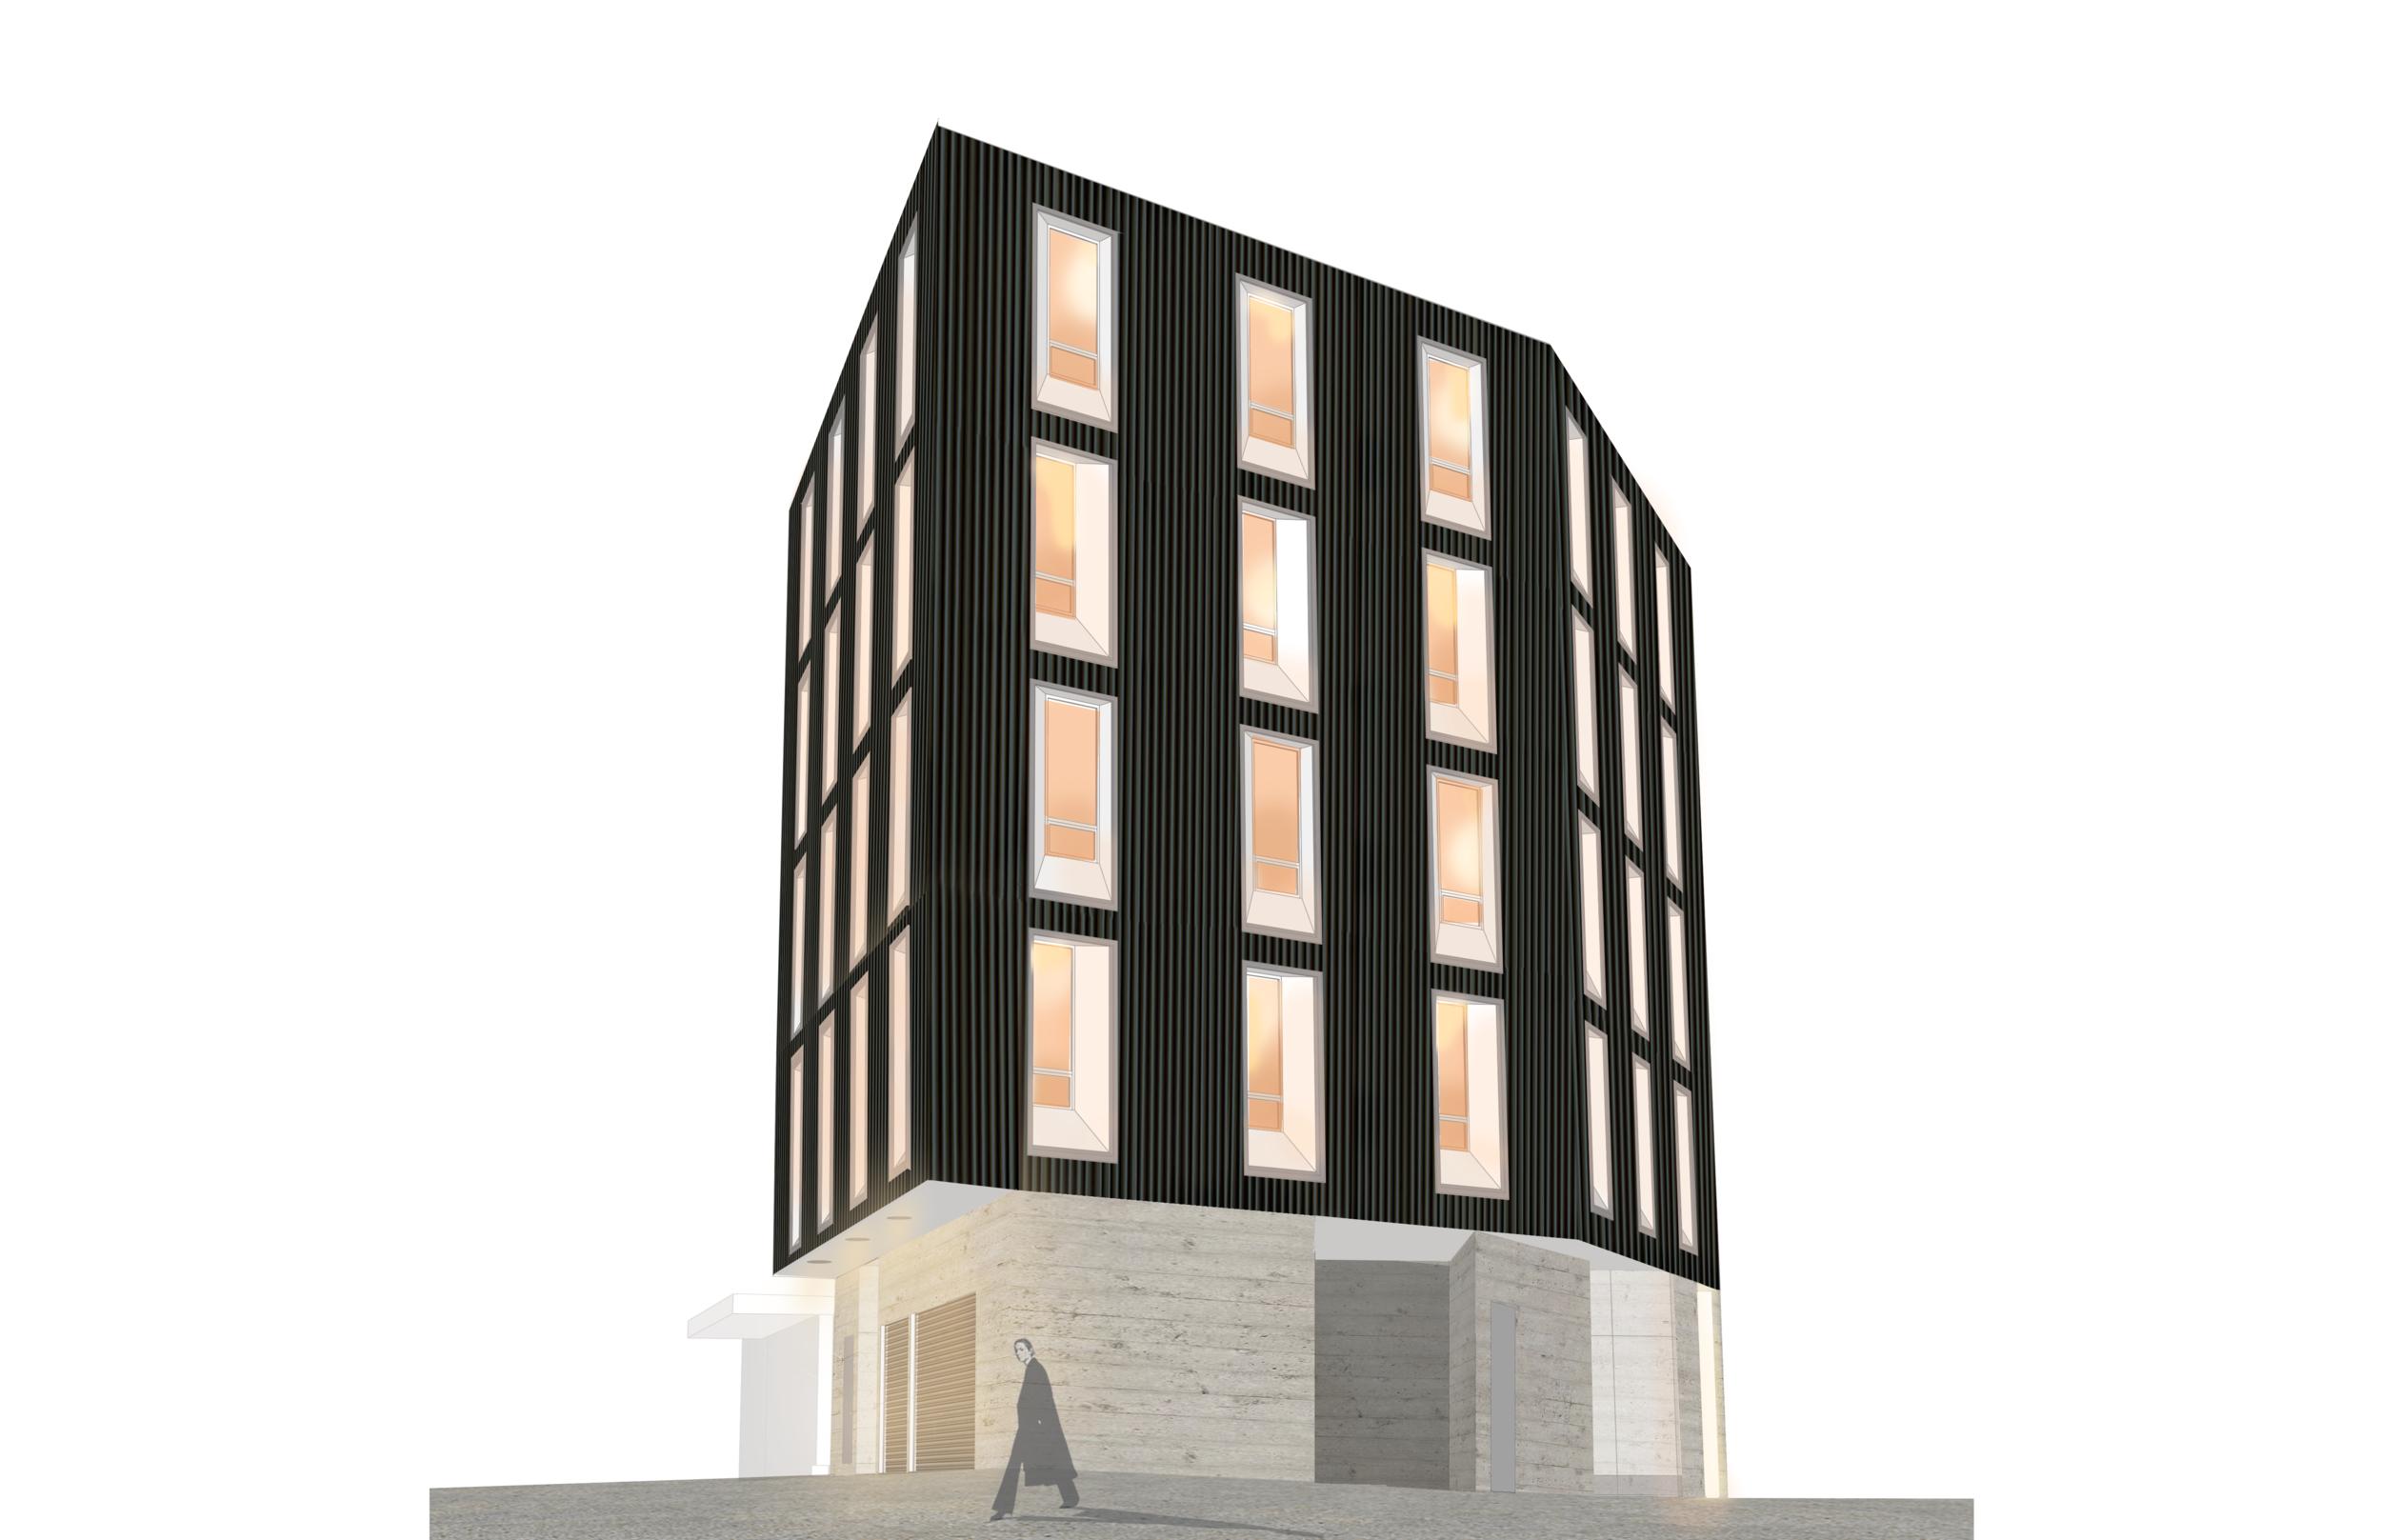 Zinc Laneway Office Ontario Cumulus Architects Inc. In Progress